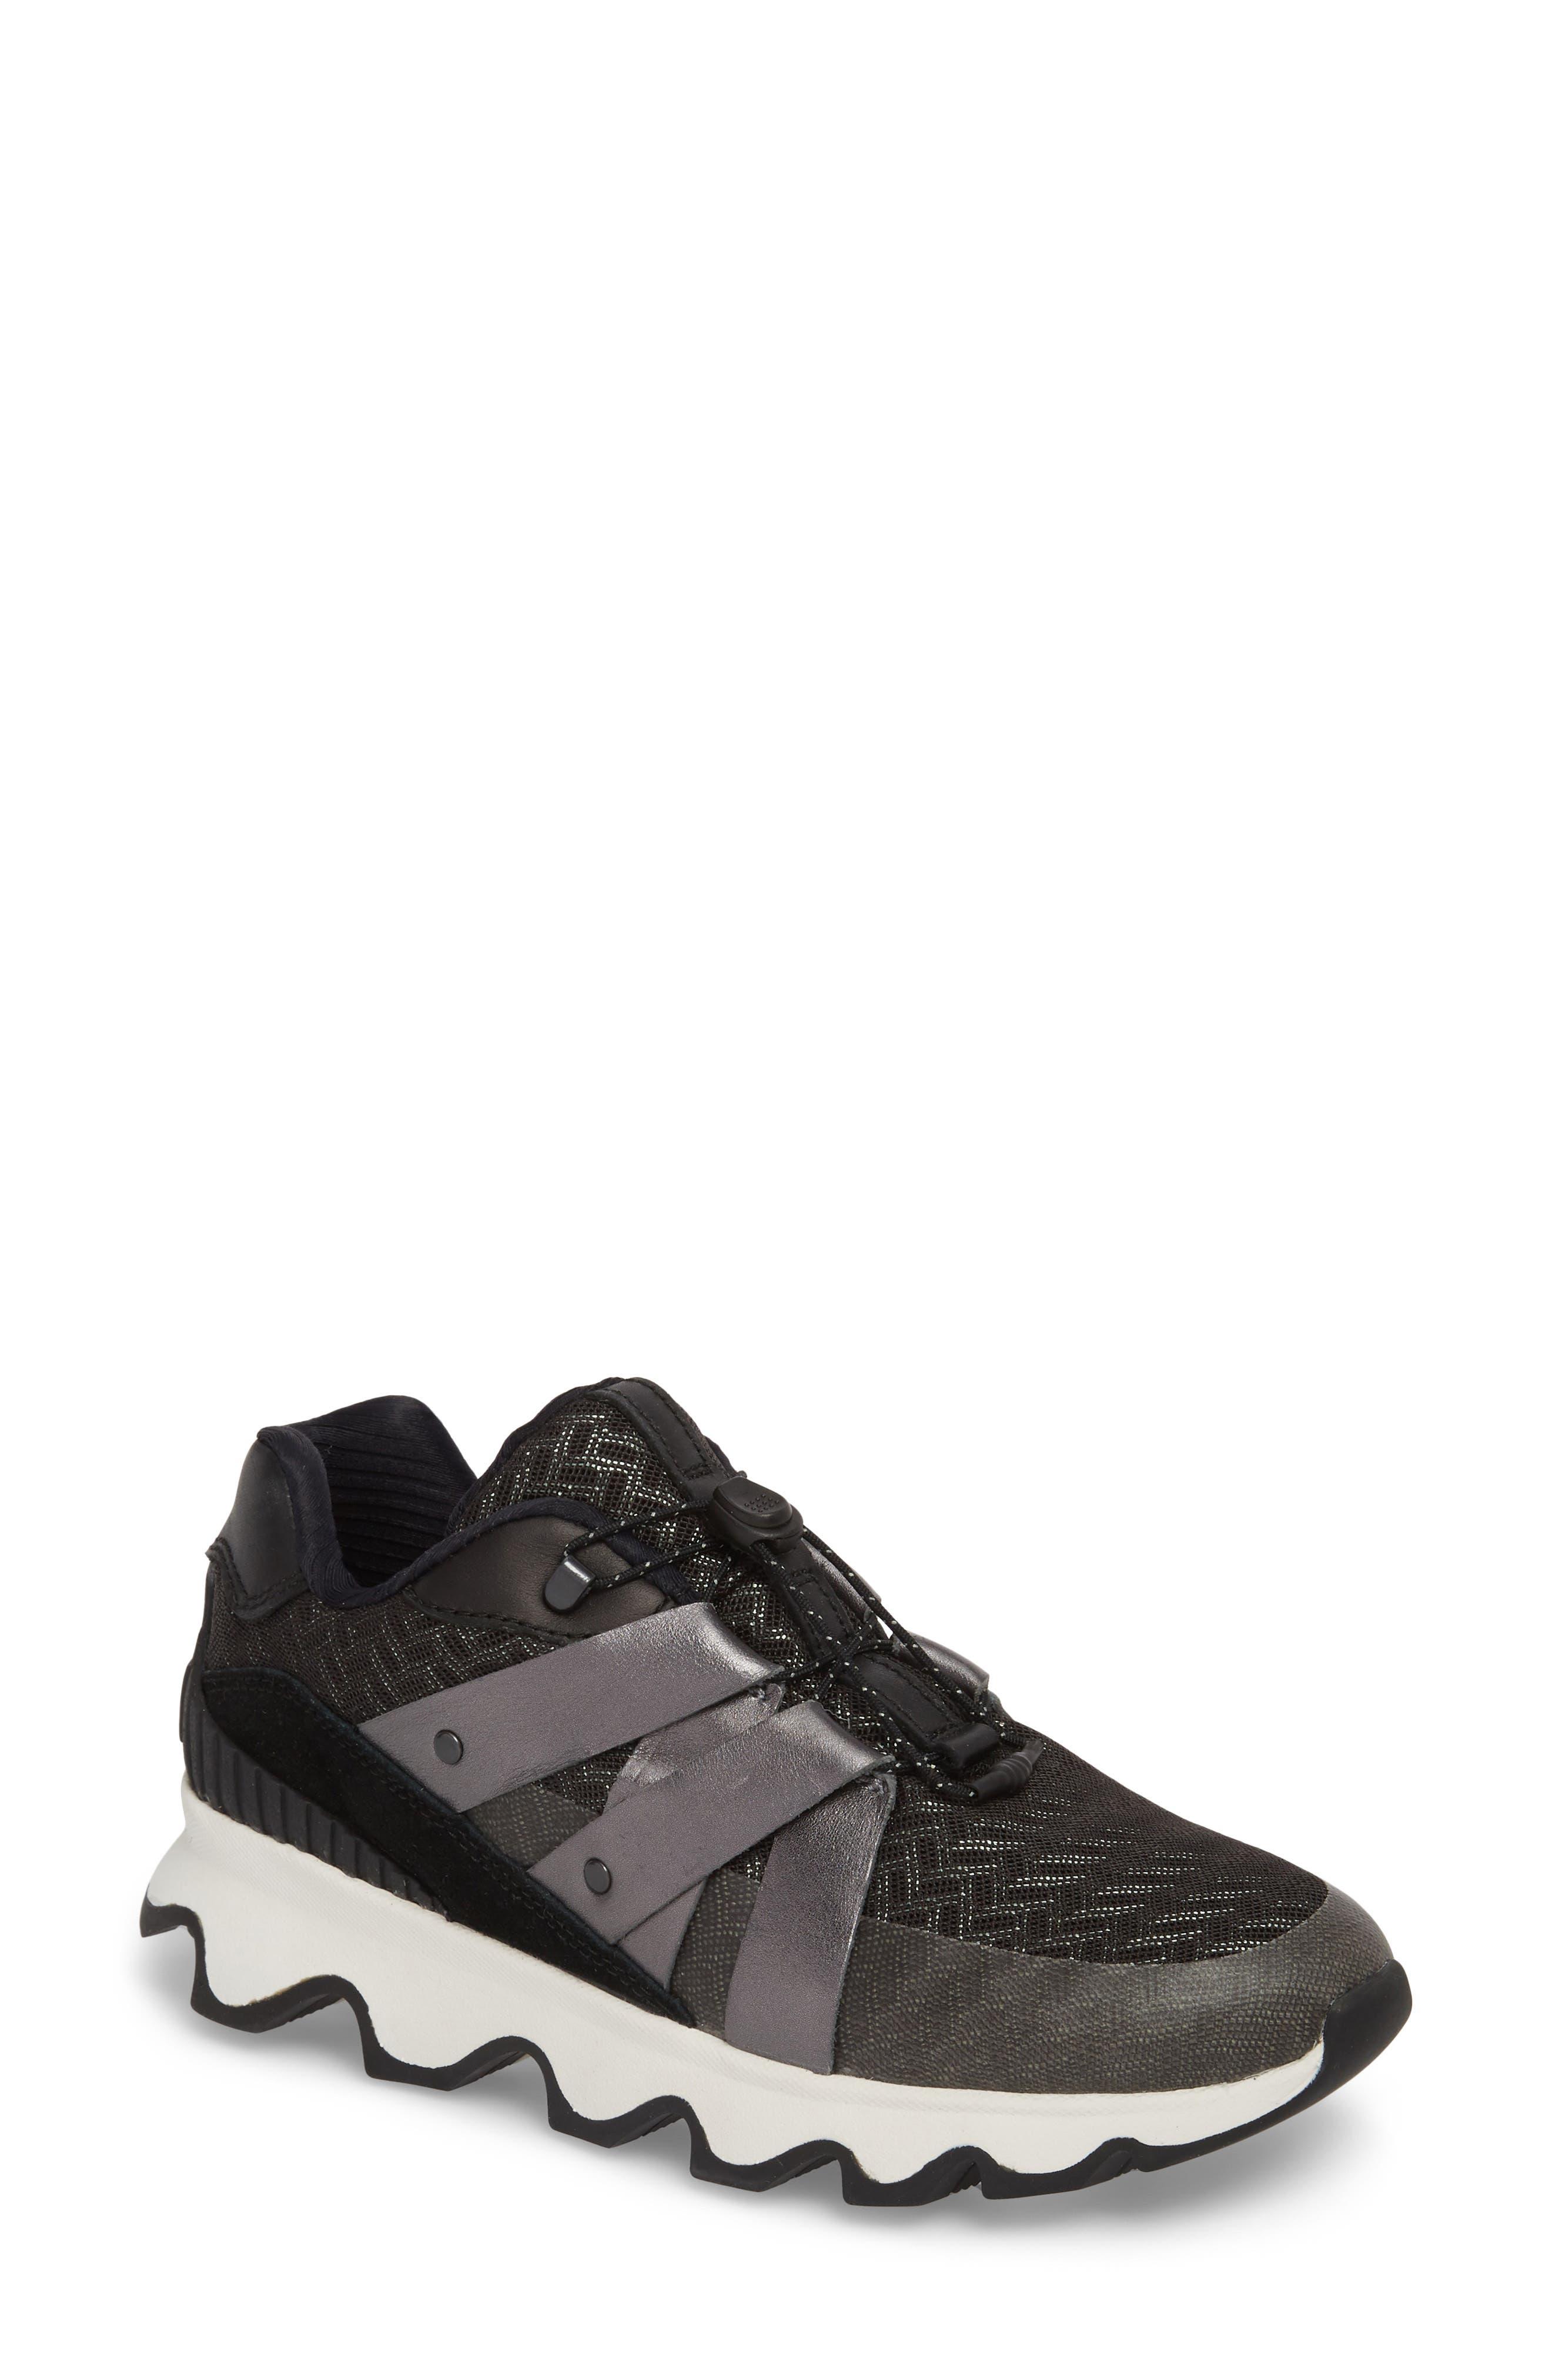 Kinetic Speed Sneaker,                             Main thumbnail 1, color,                             010